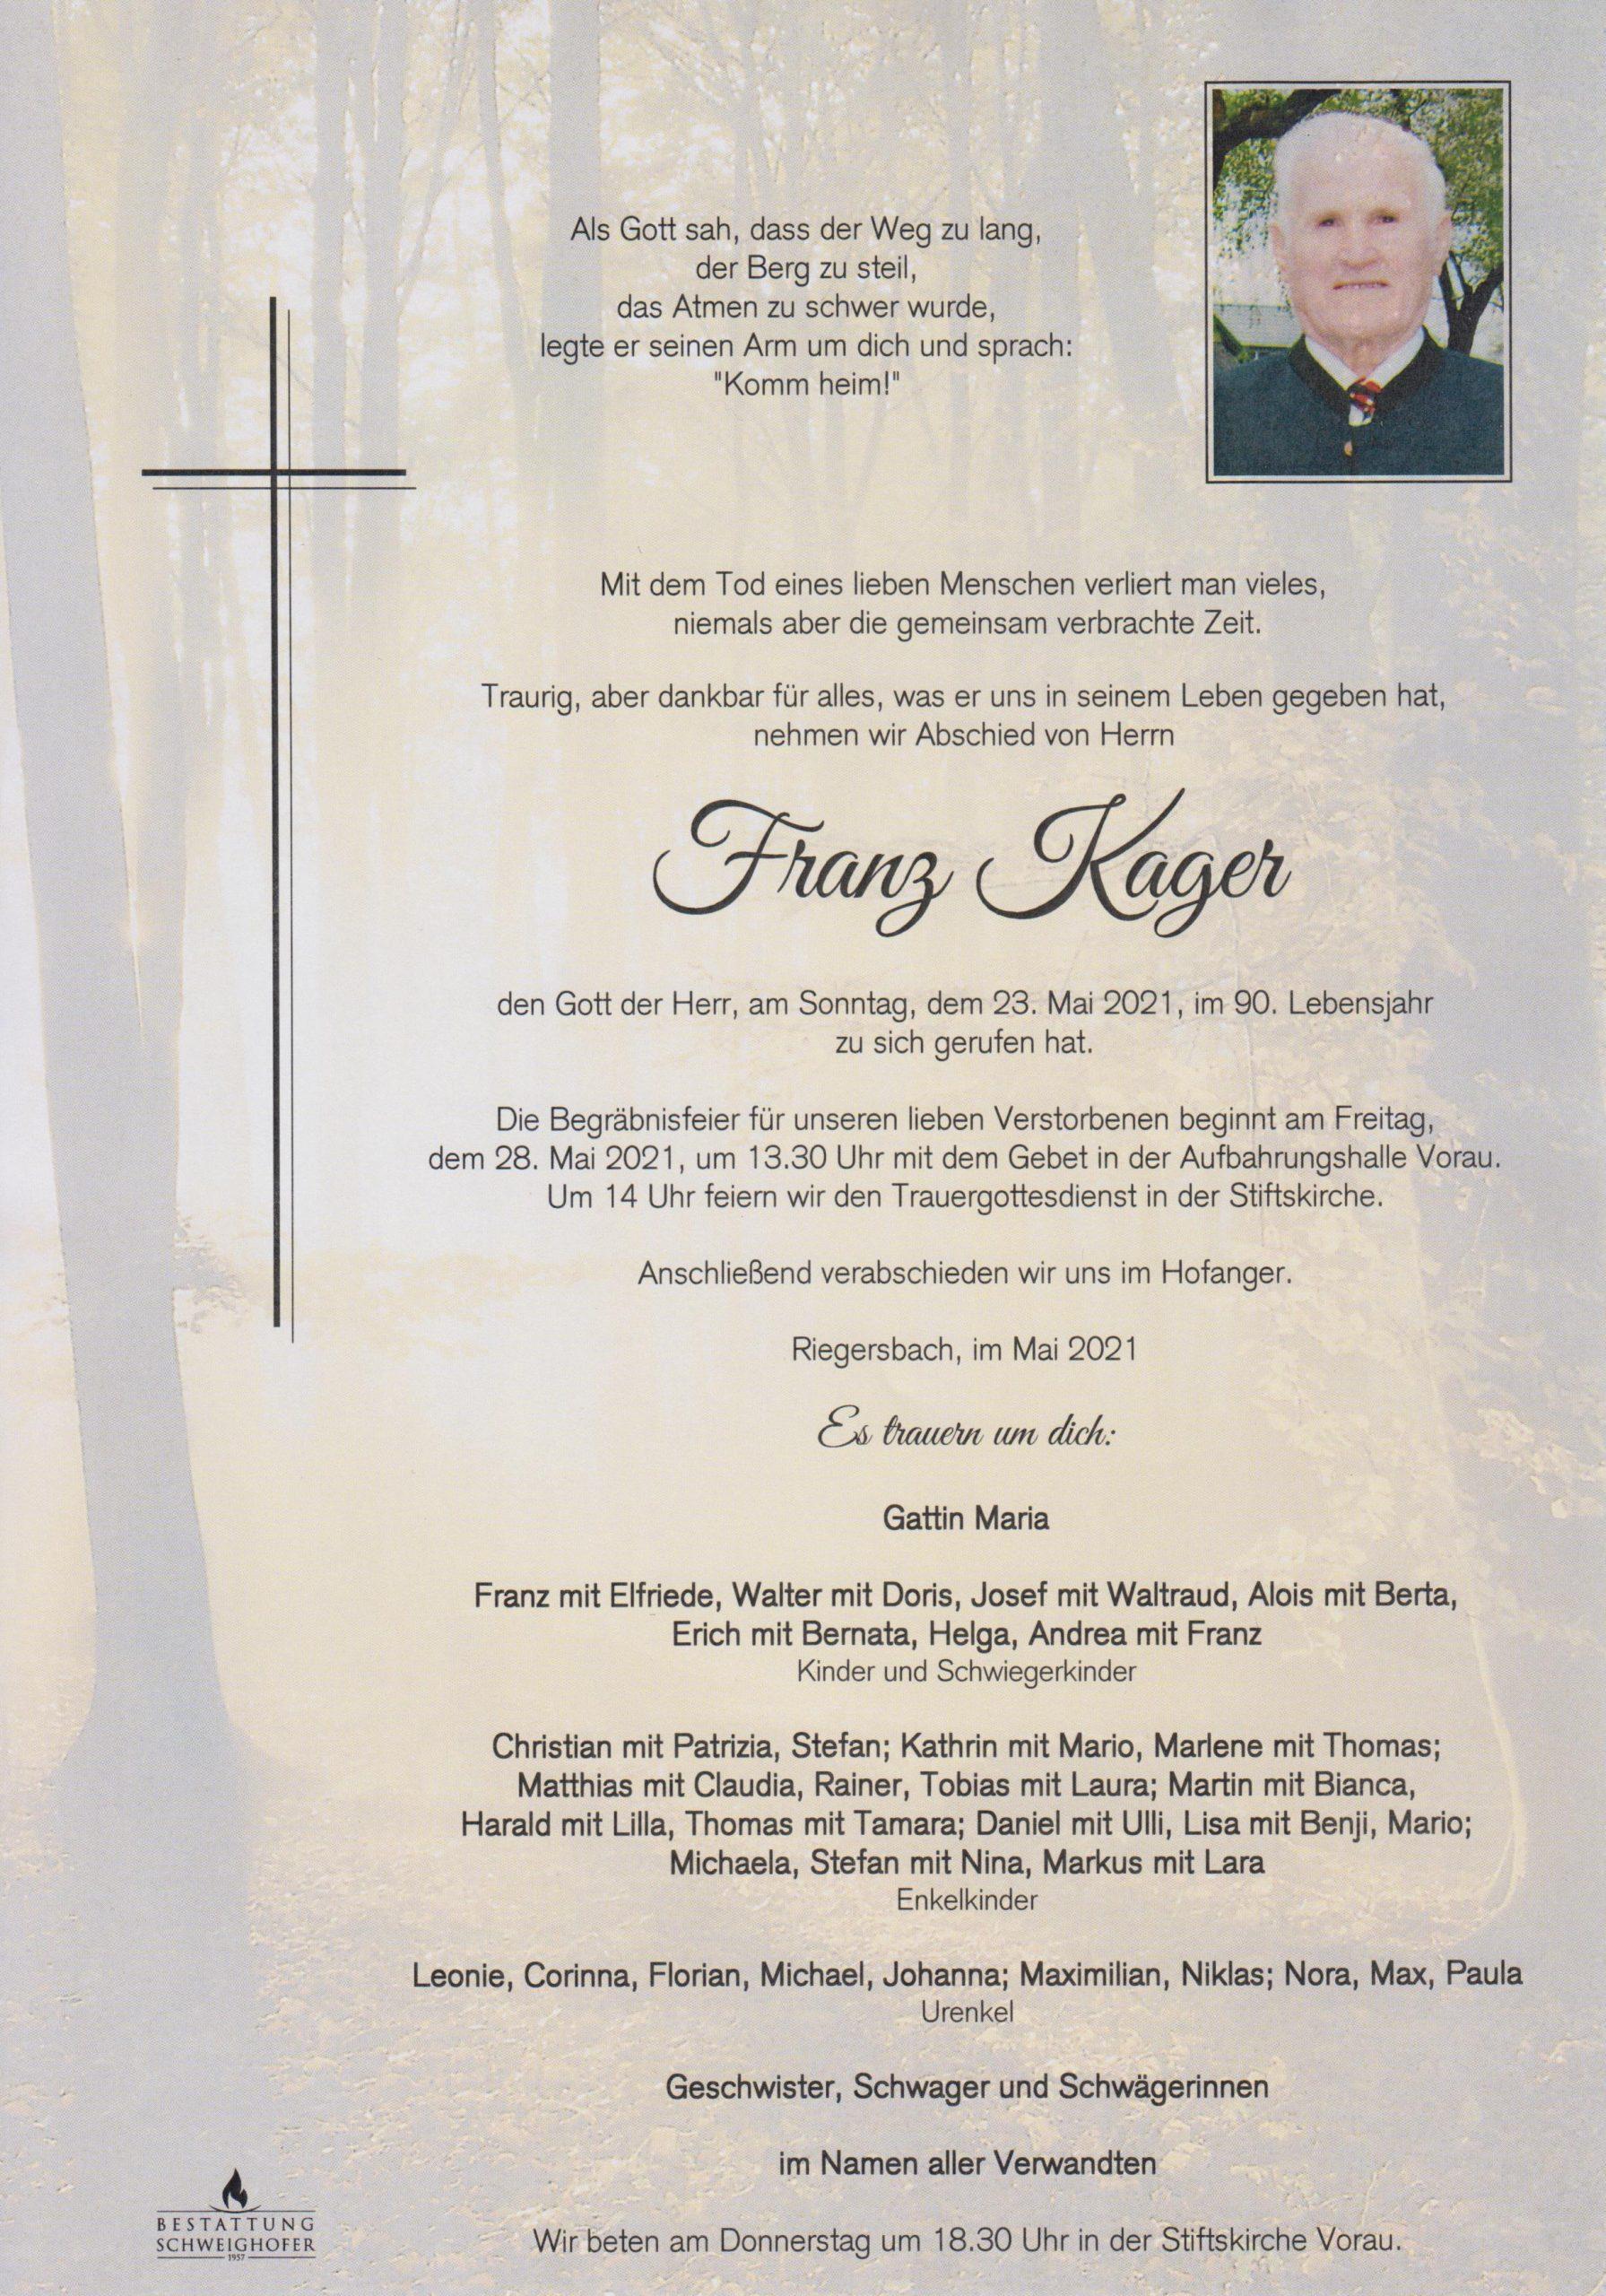 Franz Kager